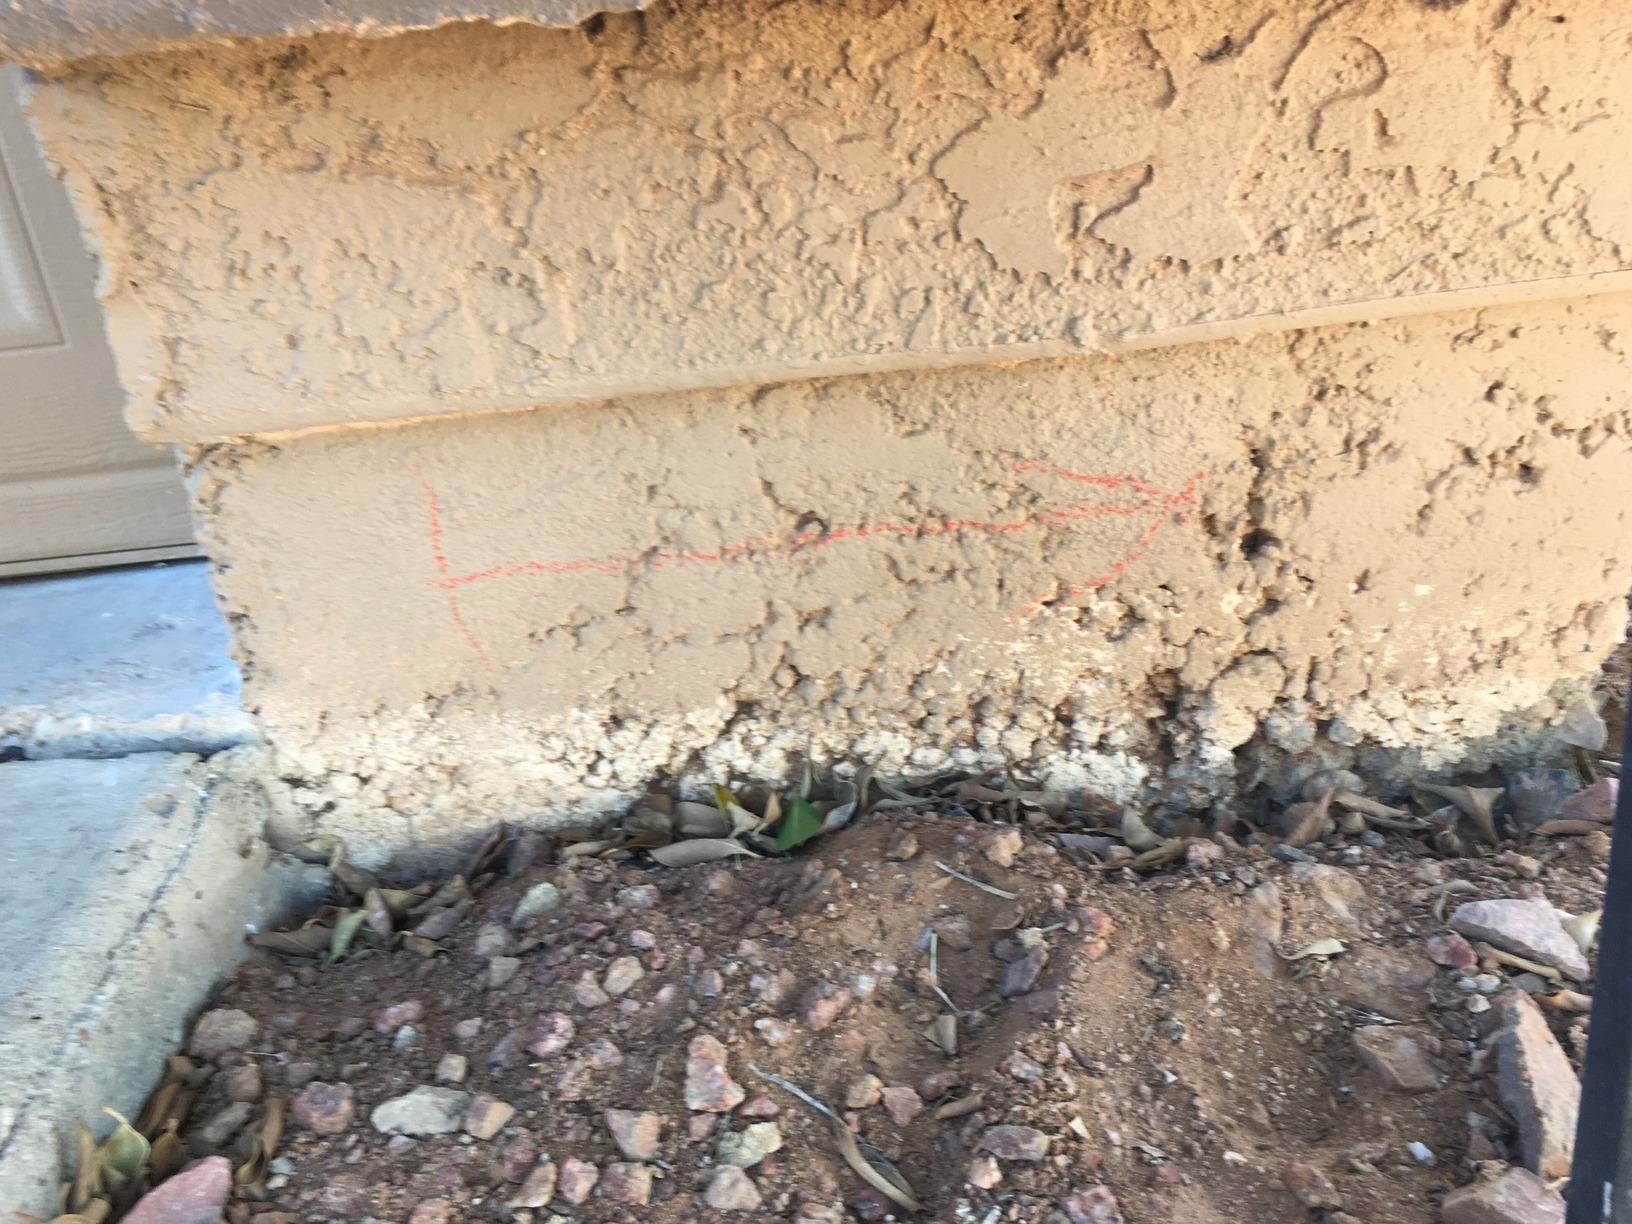 Concrete Stem Wall Repair - Gilbert, AZ 1.21.2021 - Before Photo